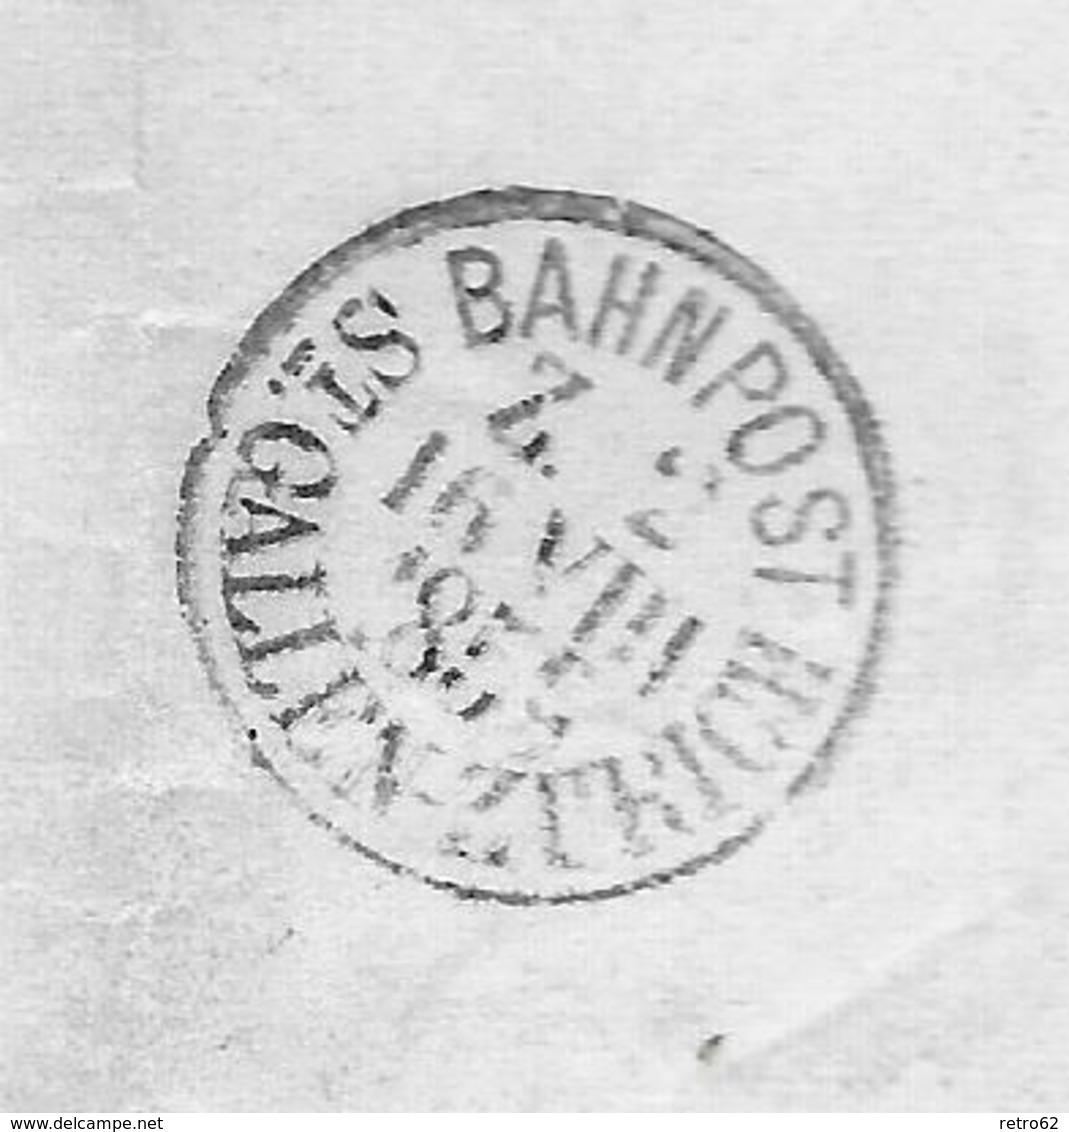 1854-1862 Helvetia (Ungezähnt) Strubel → UNIKAT !!! Rundstempel WATTWYL 1856 Anstatt 1859 ►SBK-25B3.IV◄ - 1854-1862 Helvetia (Non-dentelés)